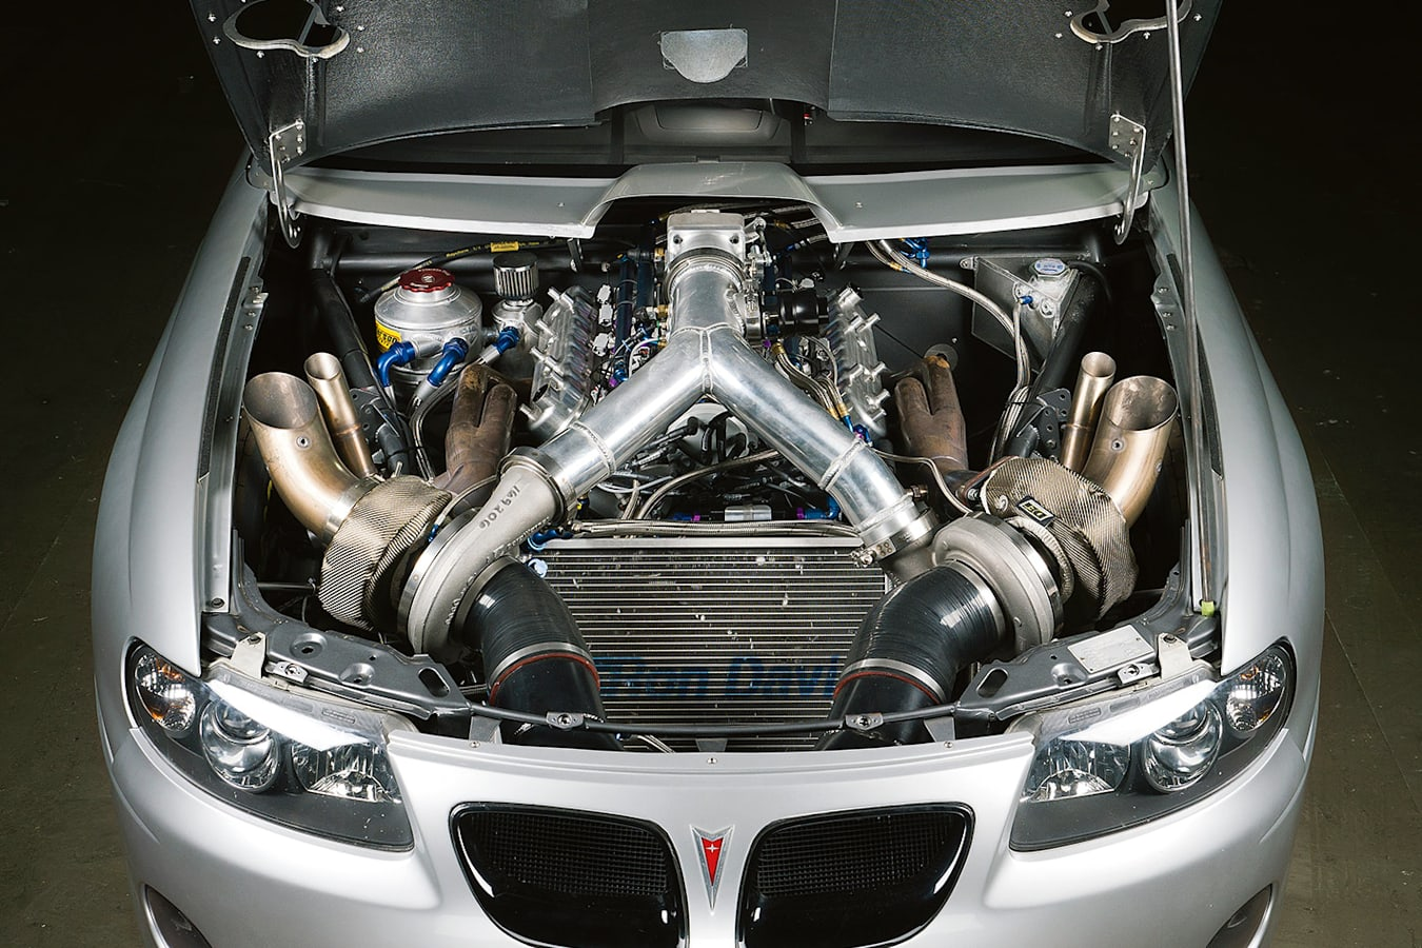 Pontiac GTO engine bay